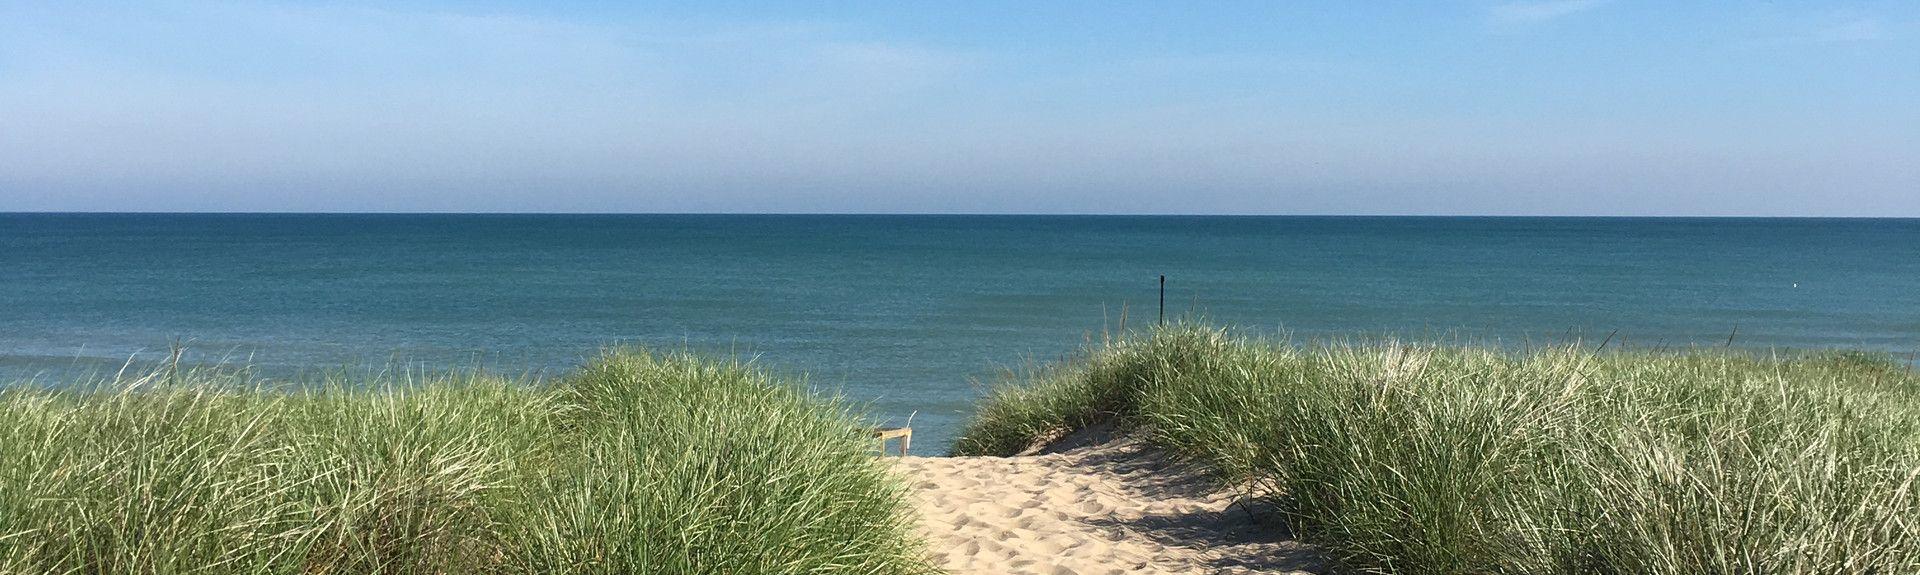 Beachwalk, Michigan City, IN, USA